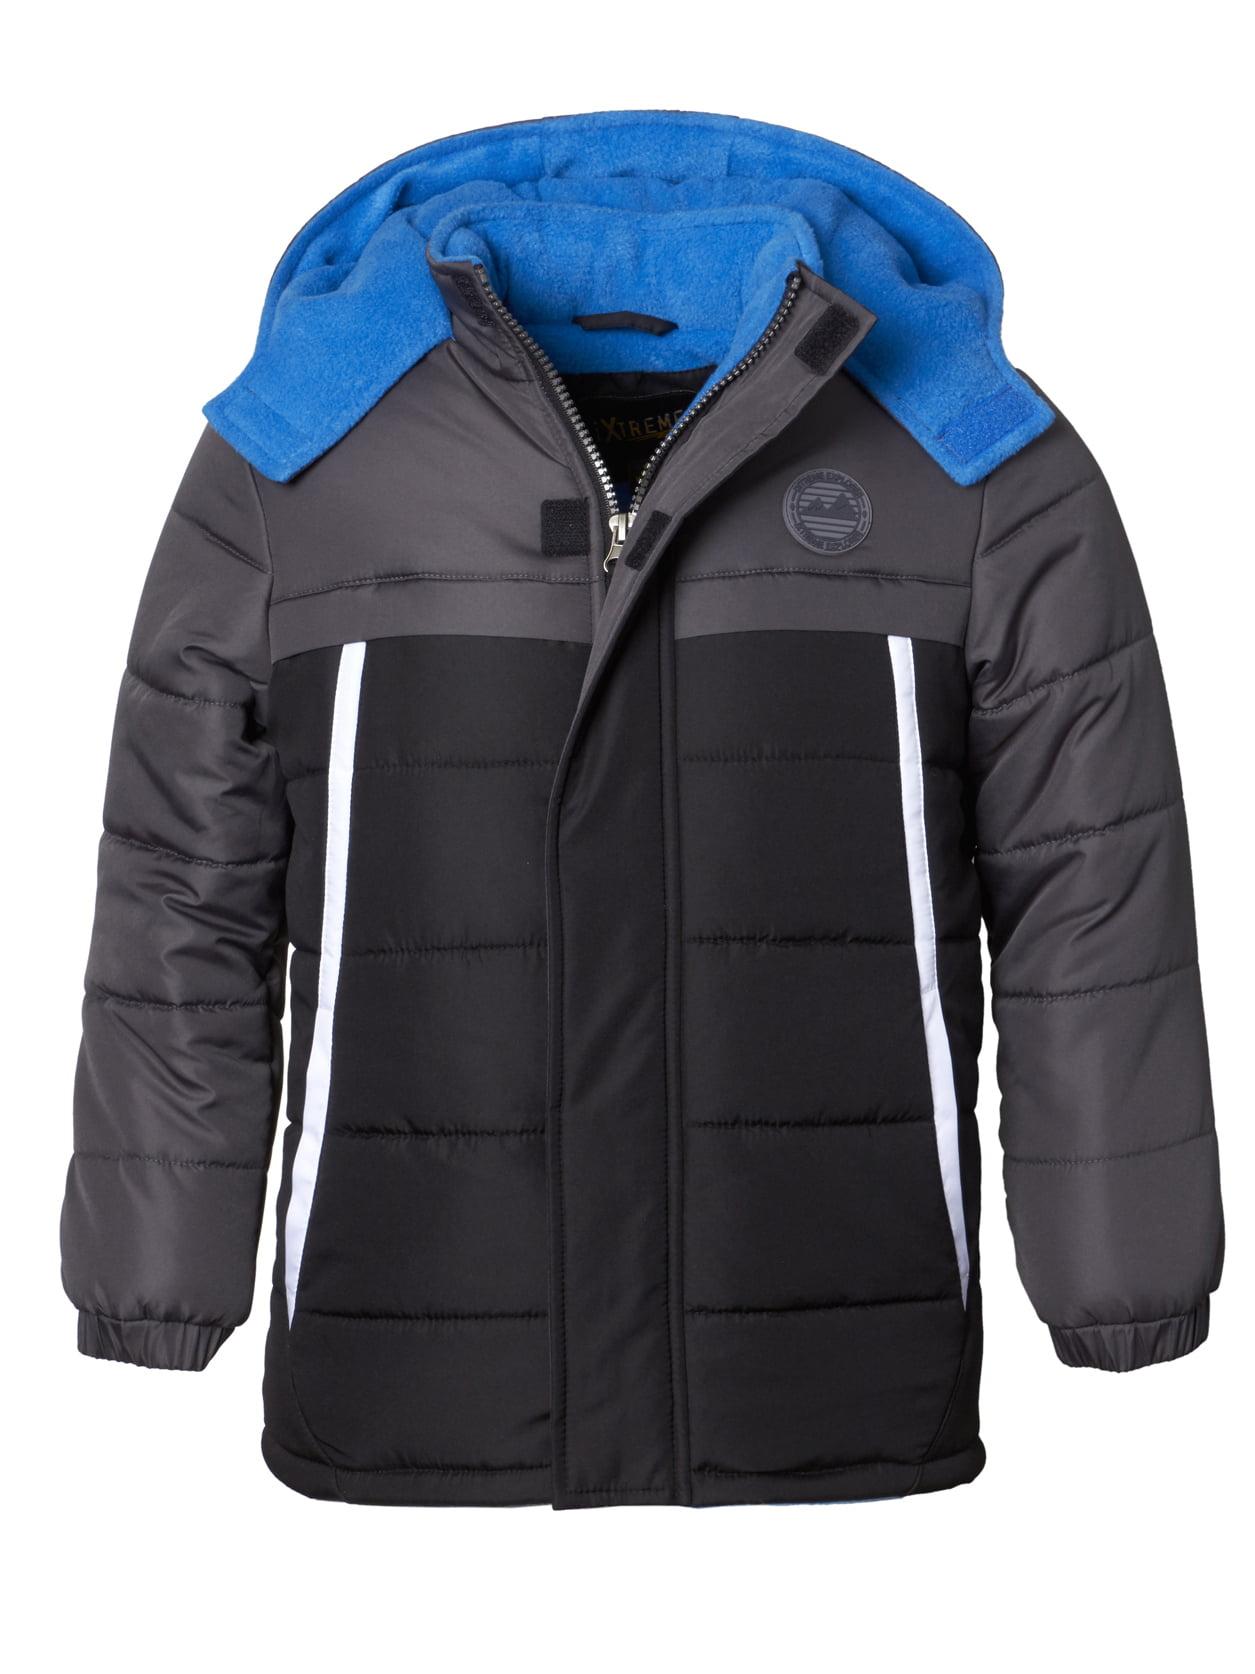 Hooded Tonal Colorblock Puffer Jacket Coat (Baby Boys & Toddler Boys)